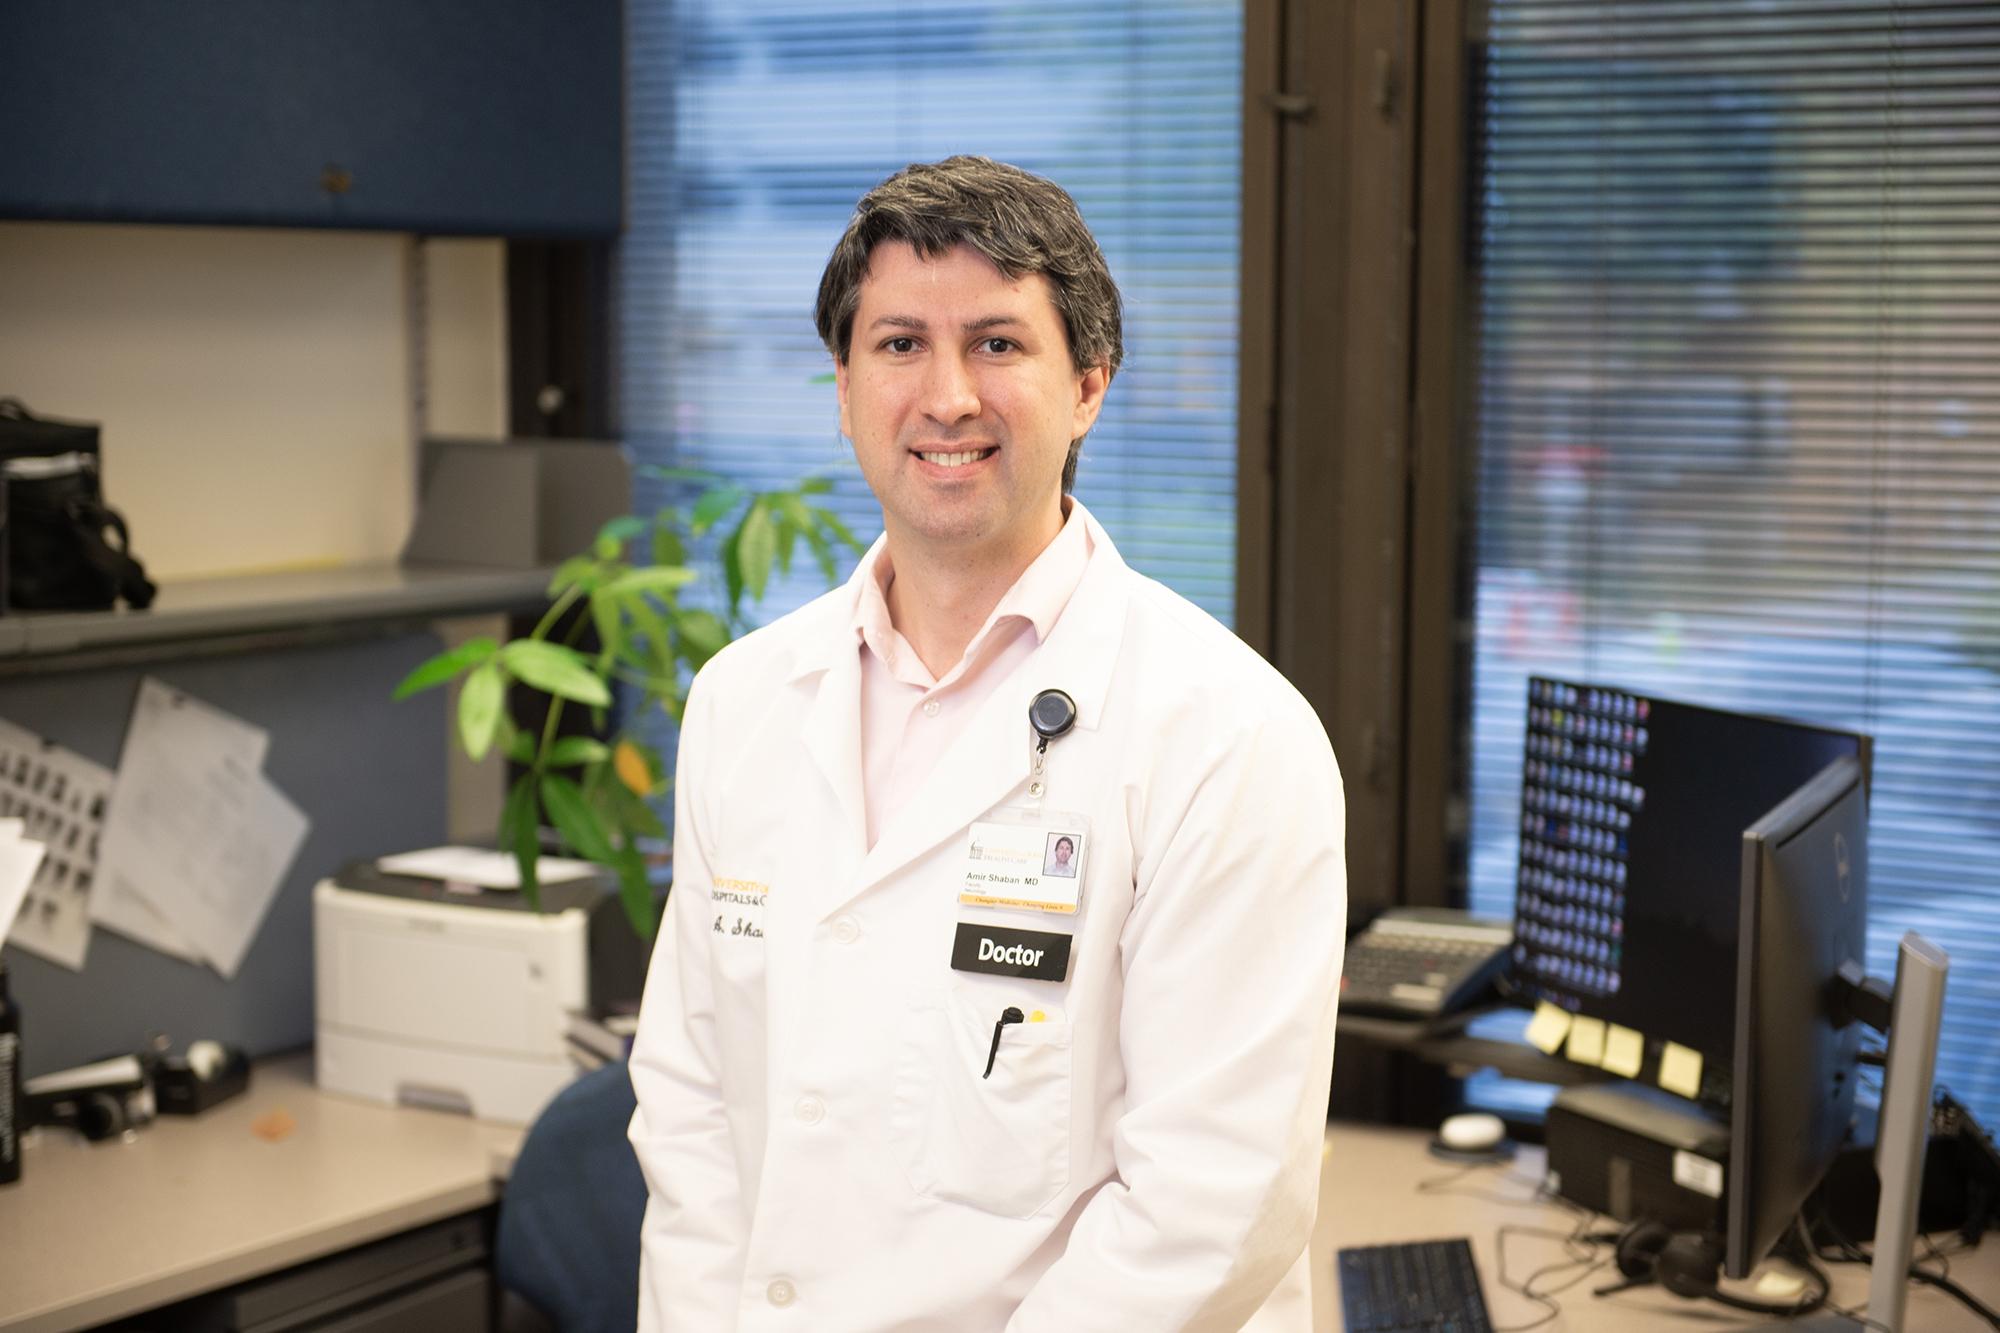 neurologist Amir Shaban, MD, in an office setting